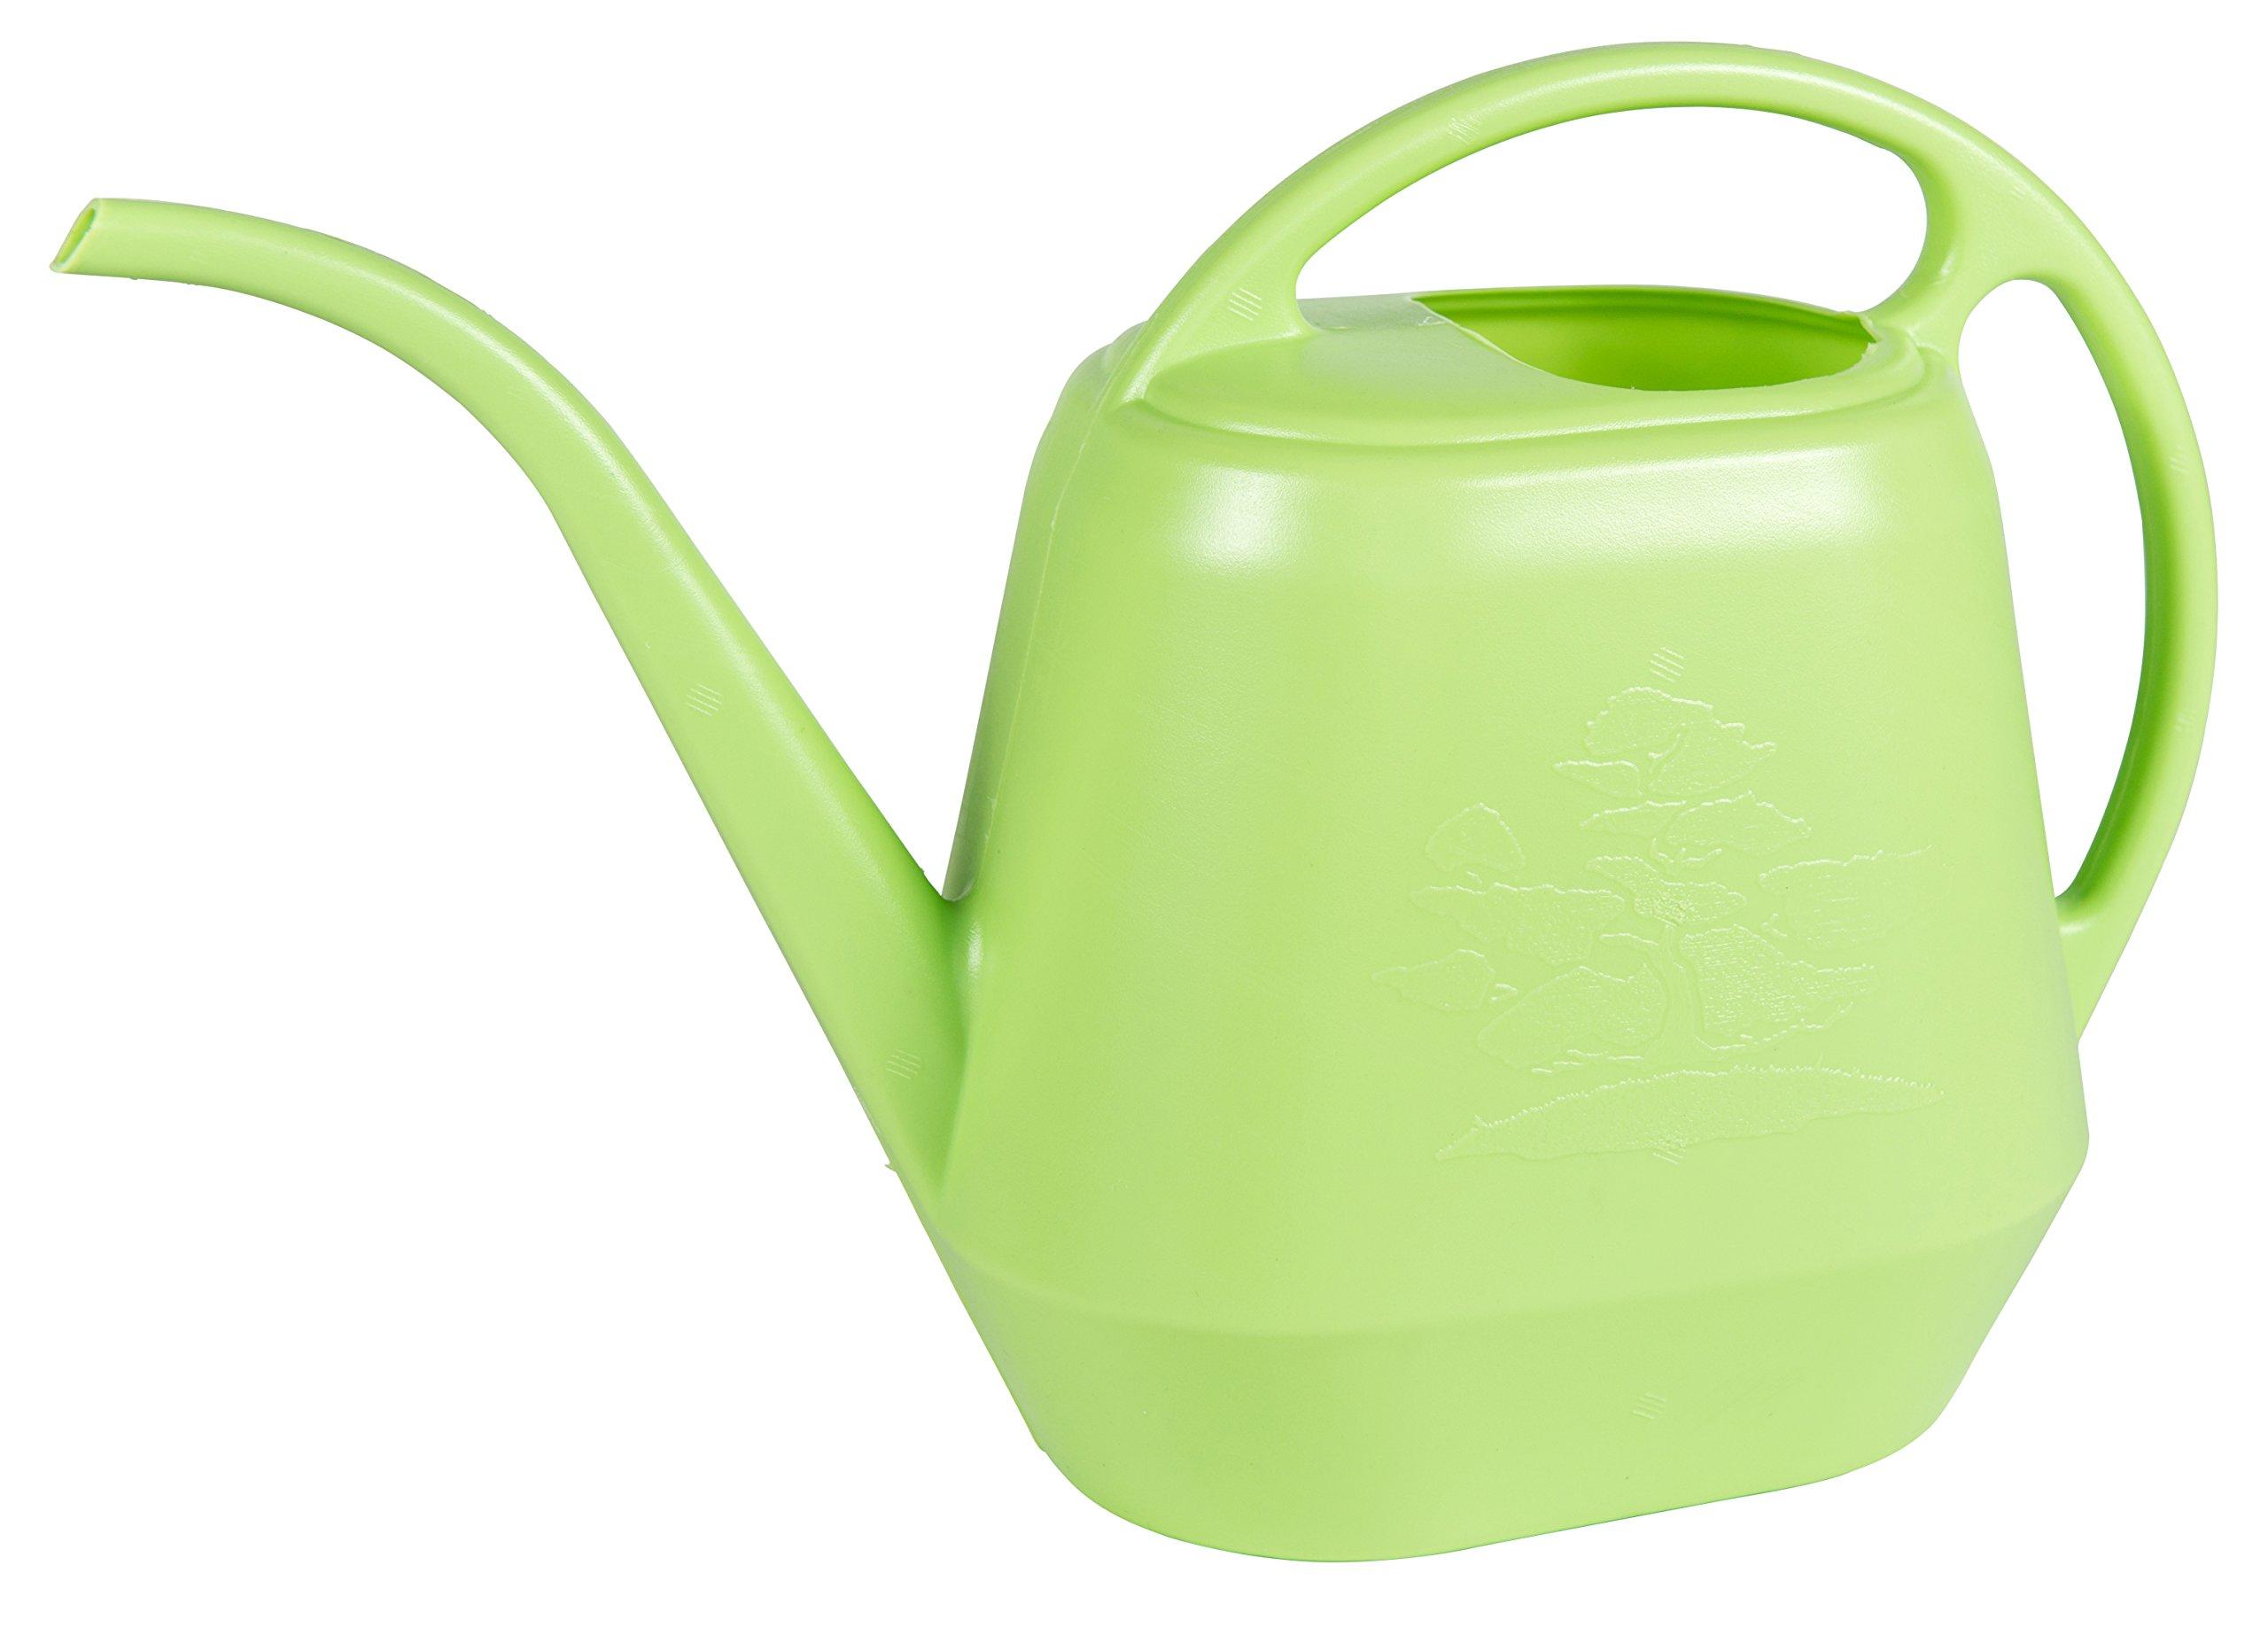 Bloem Aqua Rite Watering Can, 144 oz, Honey Dew (JW41-25)